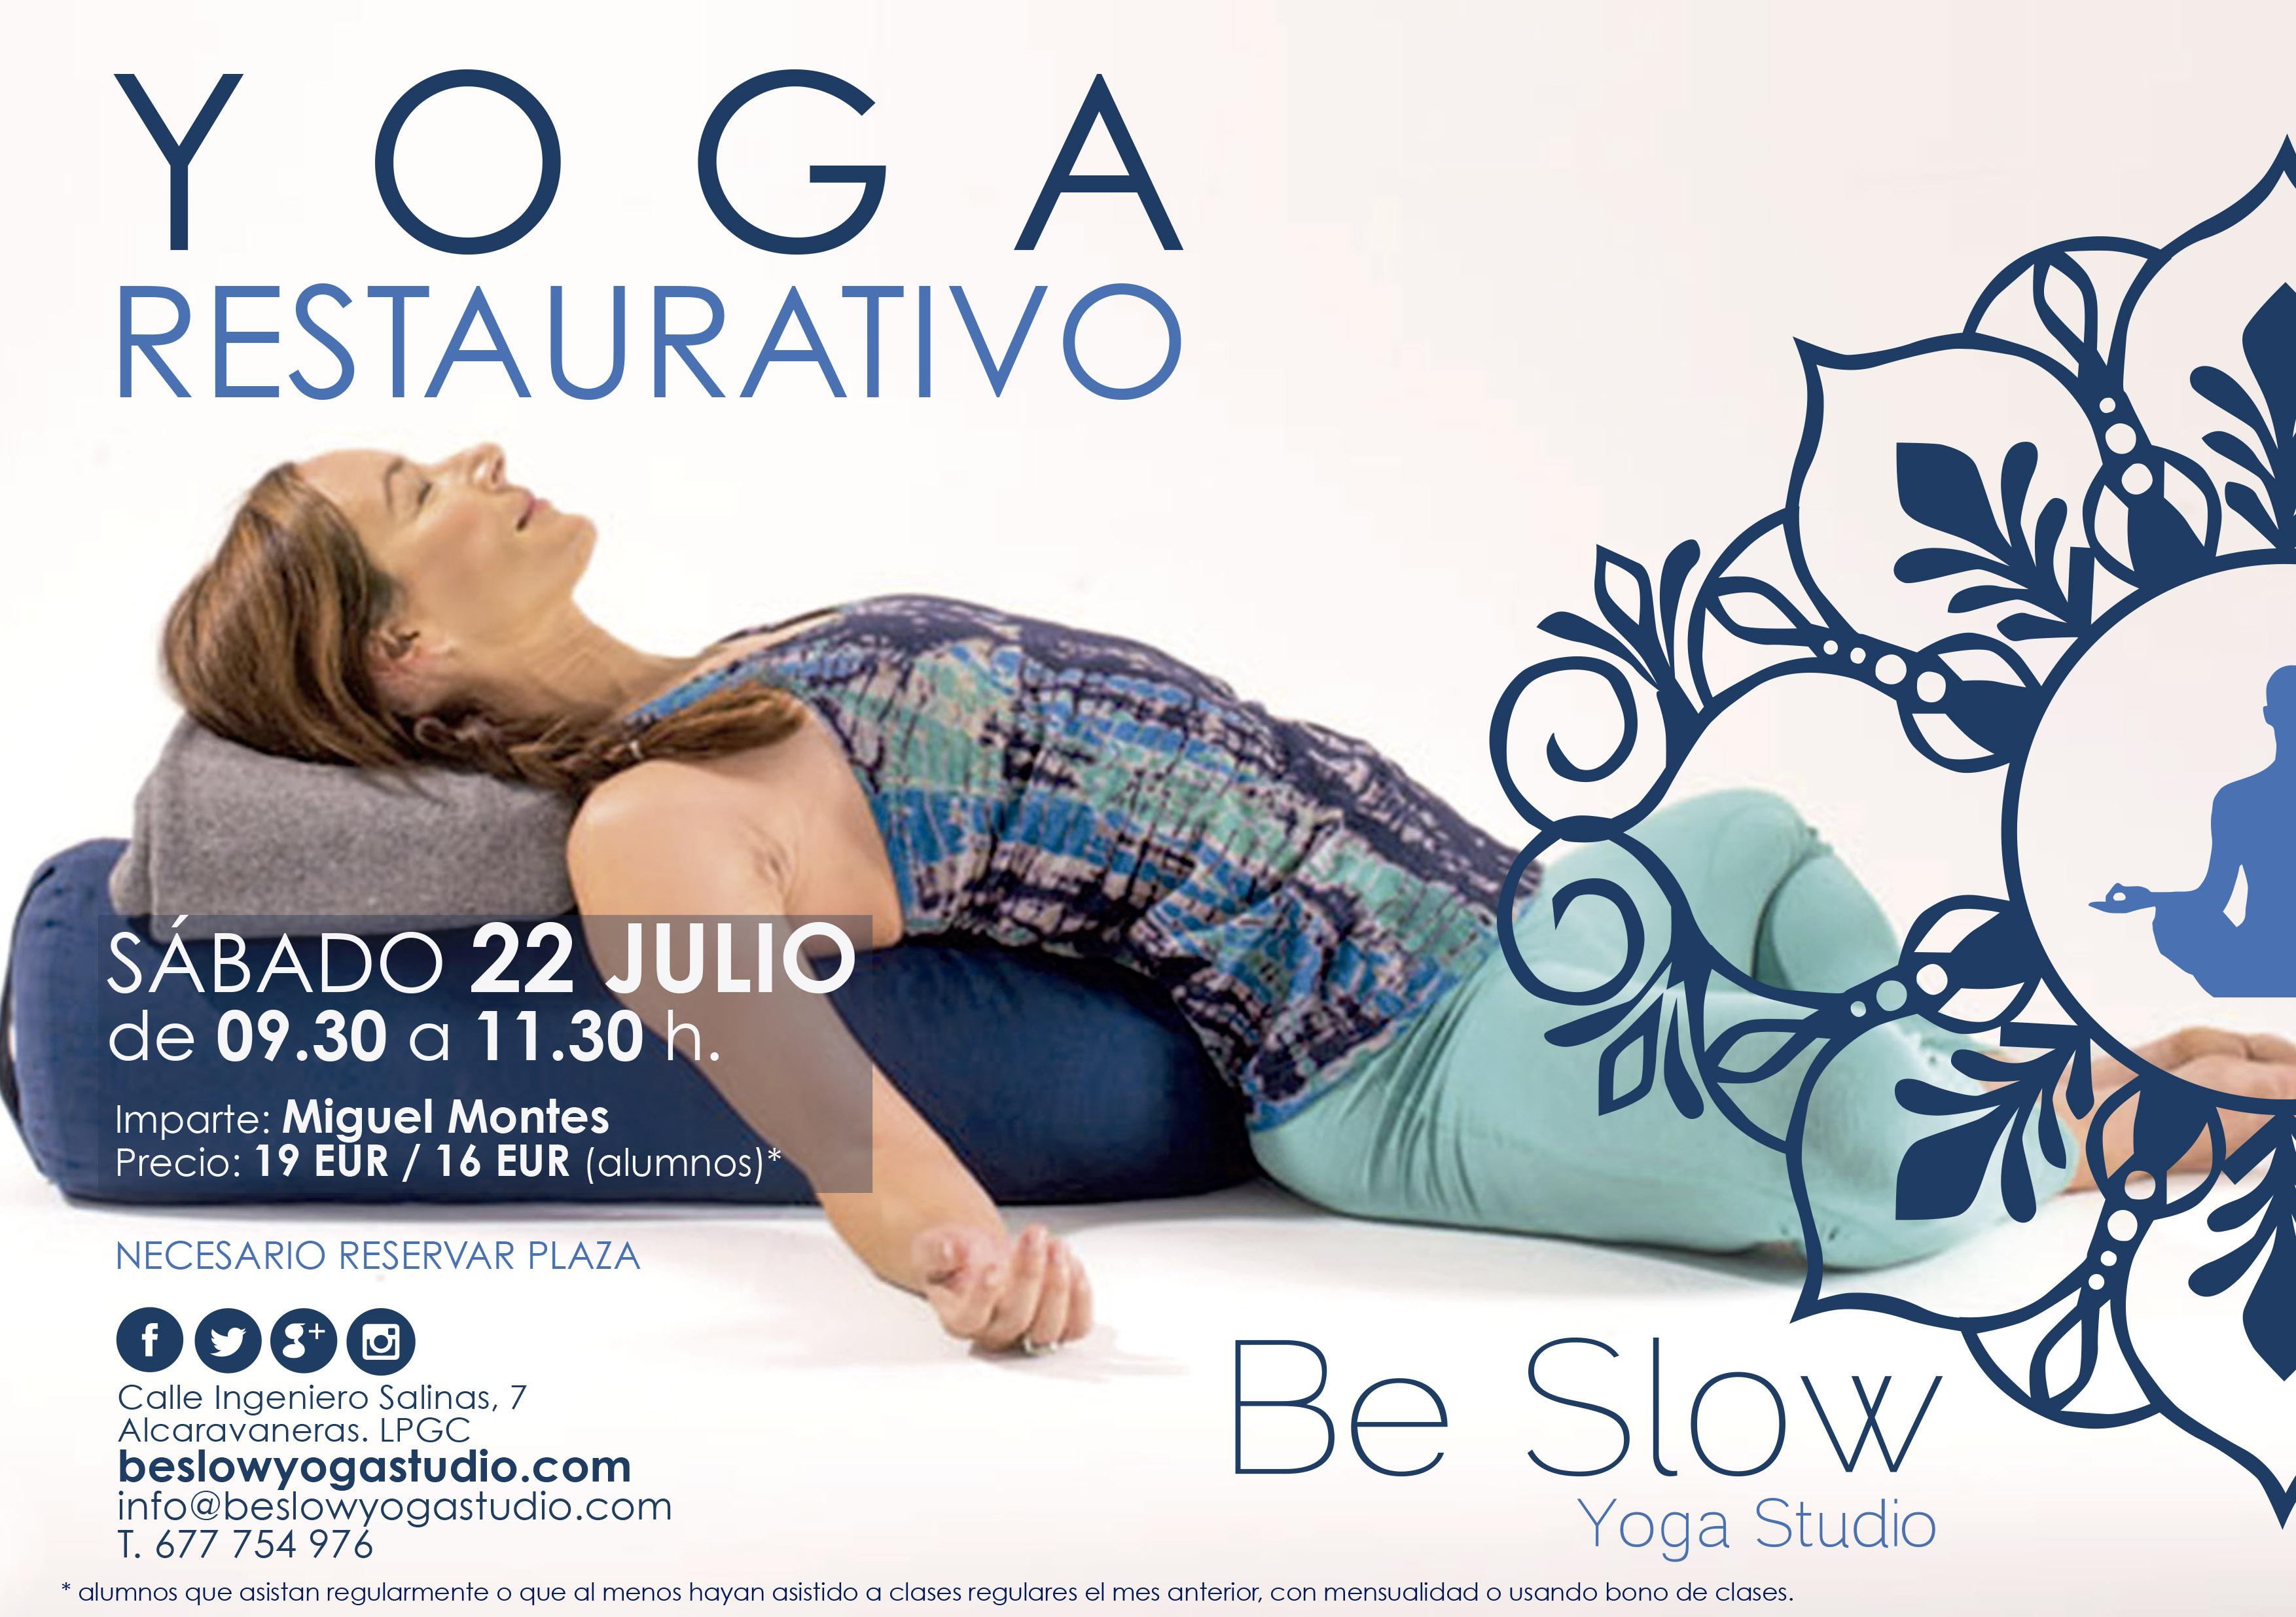 Yoga Restaurativo este sábado volvemos a relajar, reactivar, reconectar…